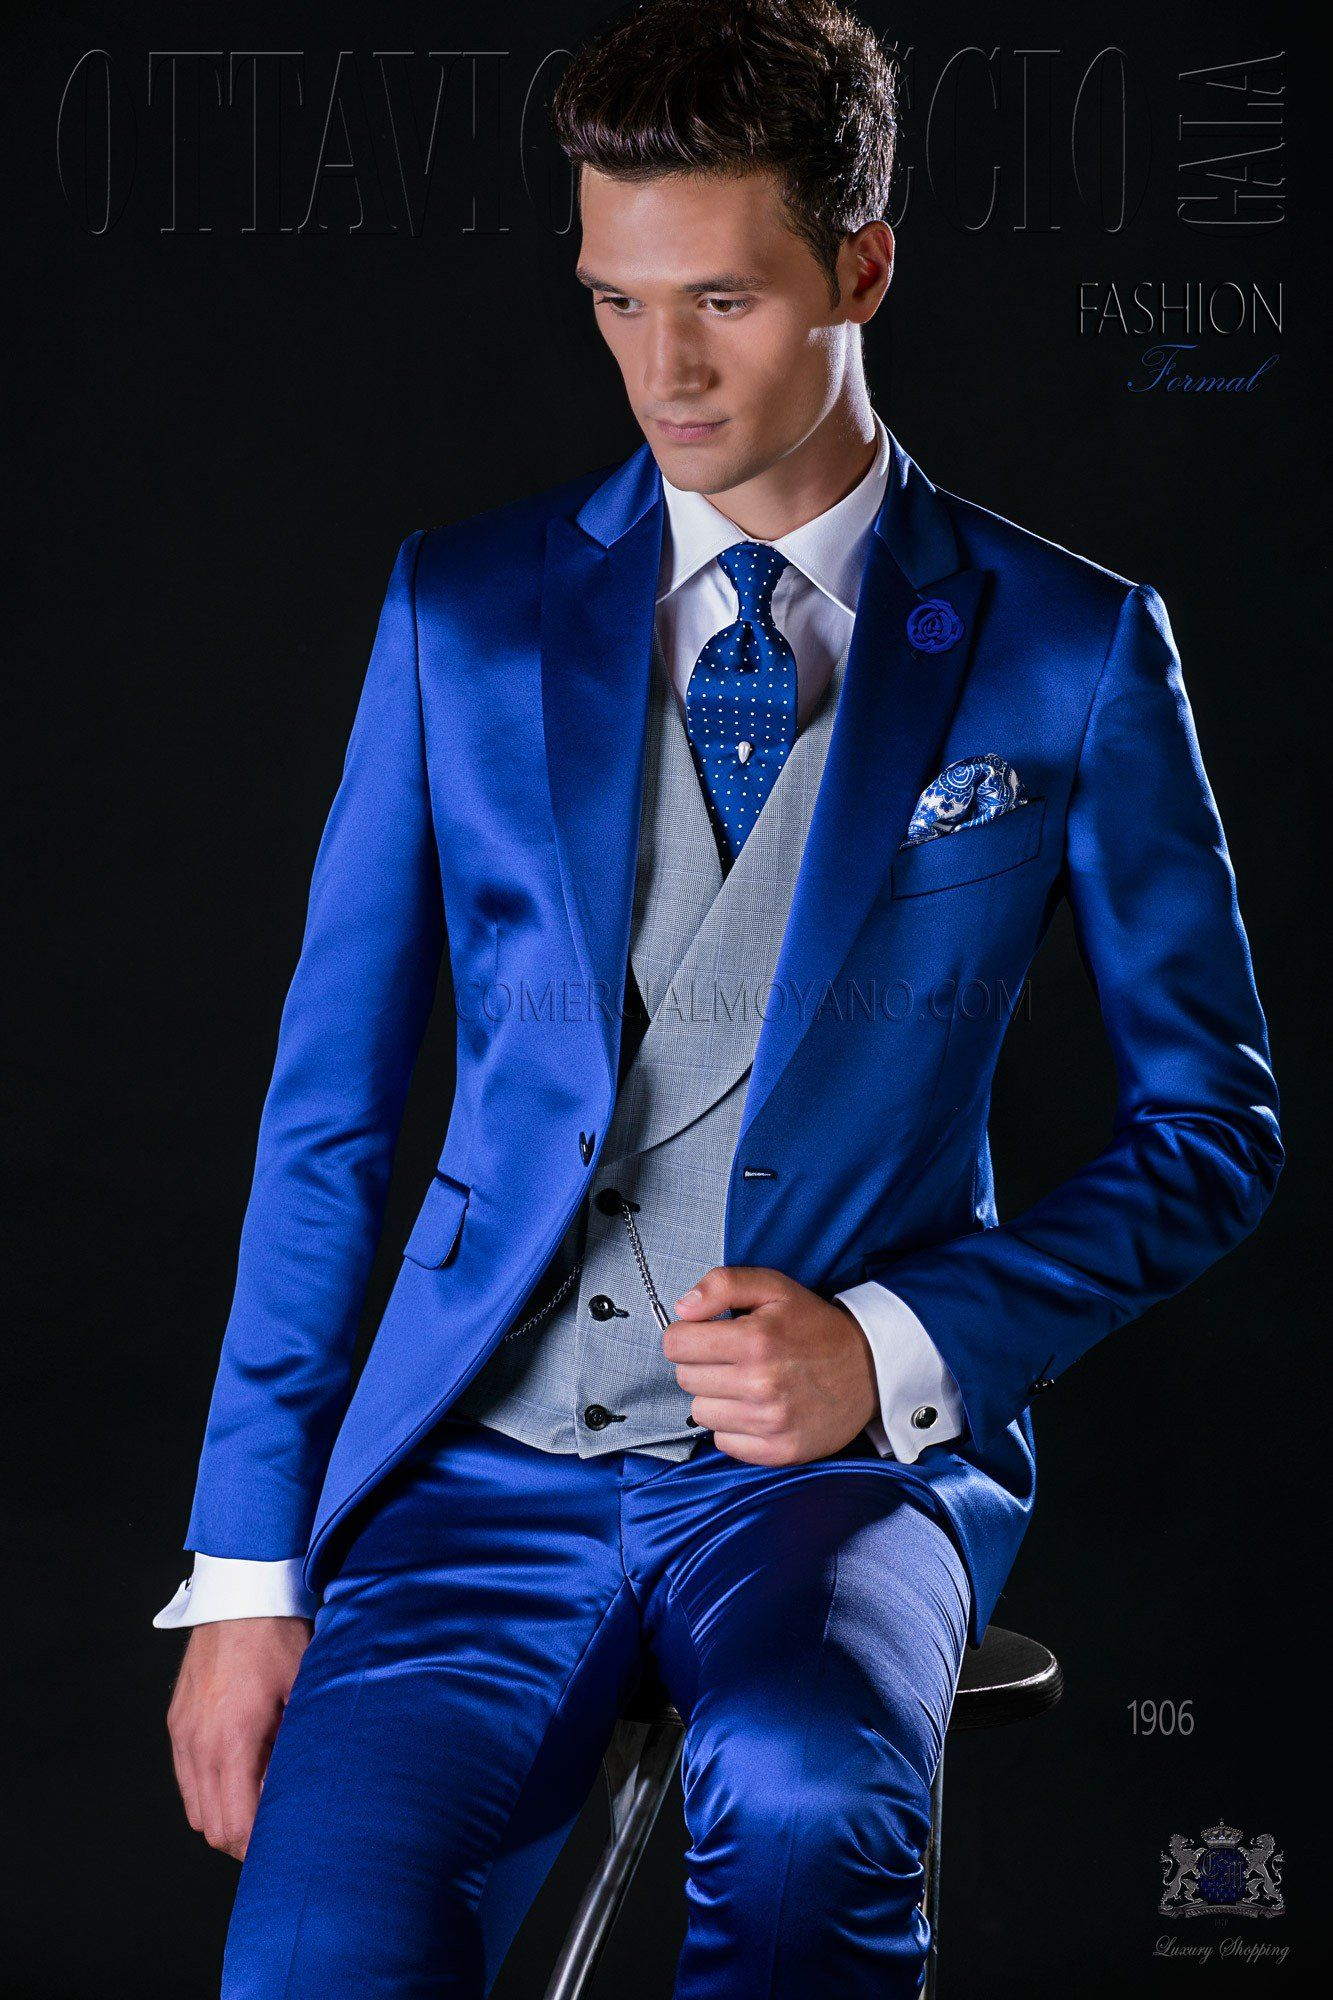 Royal blaue Bräutigam Anzug aus Satin | Pinterest | Bräutigam anzüge ...